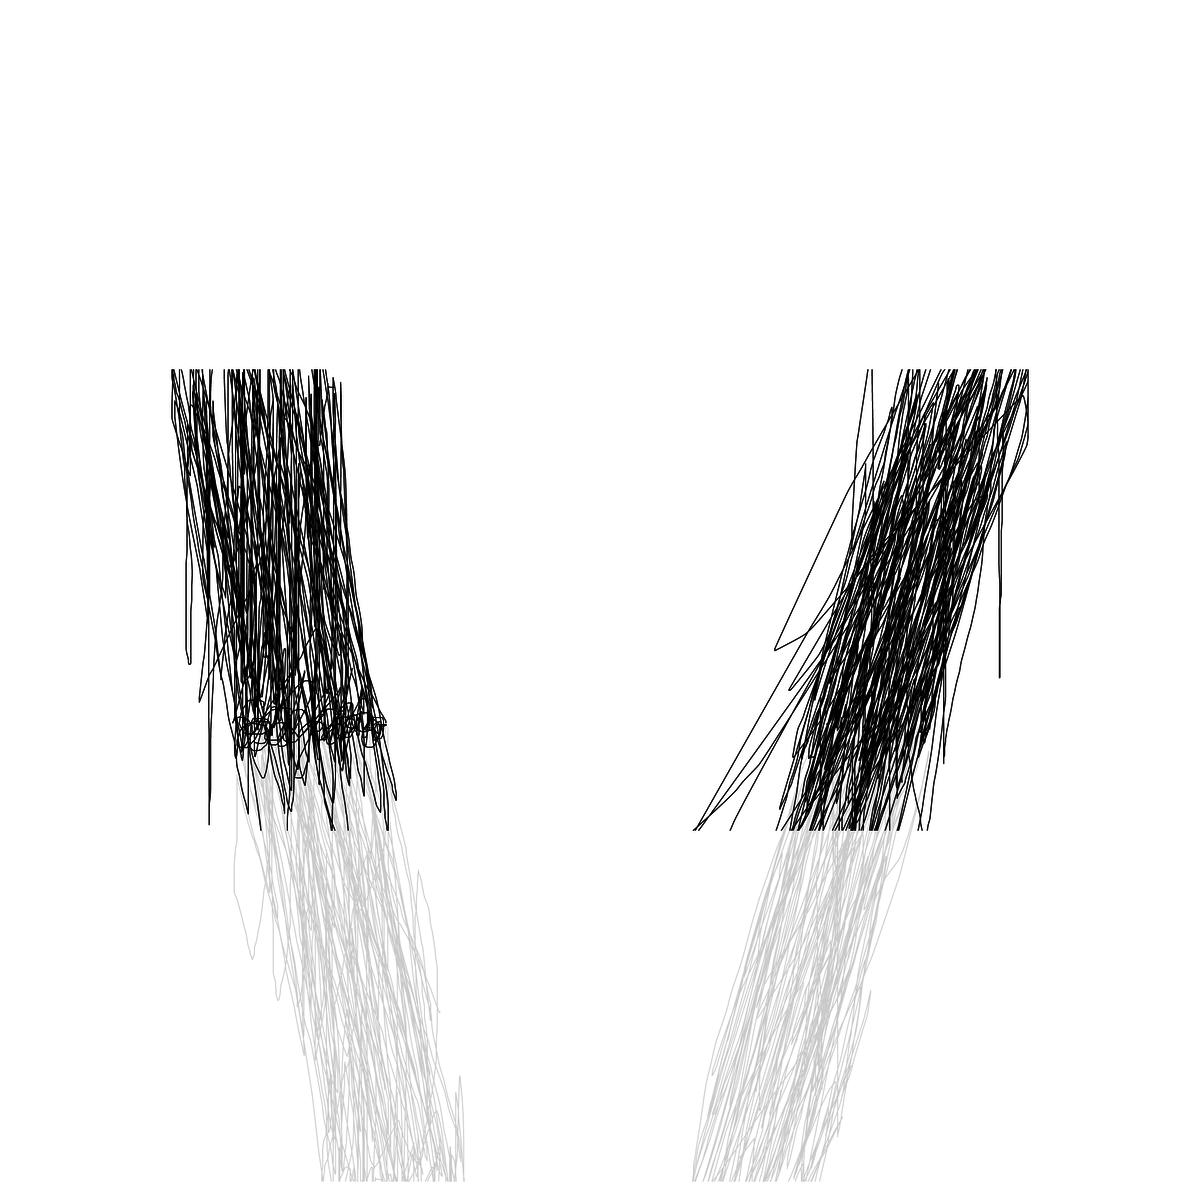 BAAAM drawing#14879 lat:39.4773521423339840lng: -74.9725799560546900